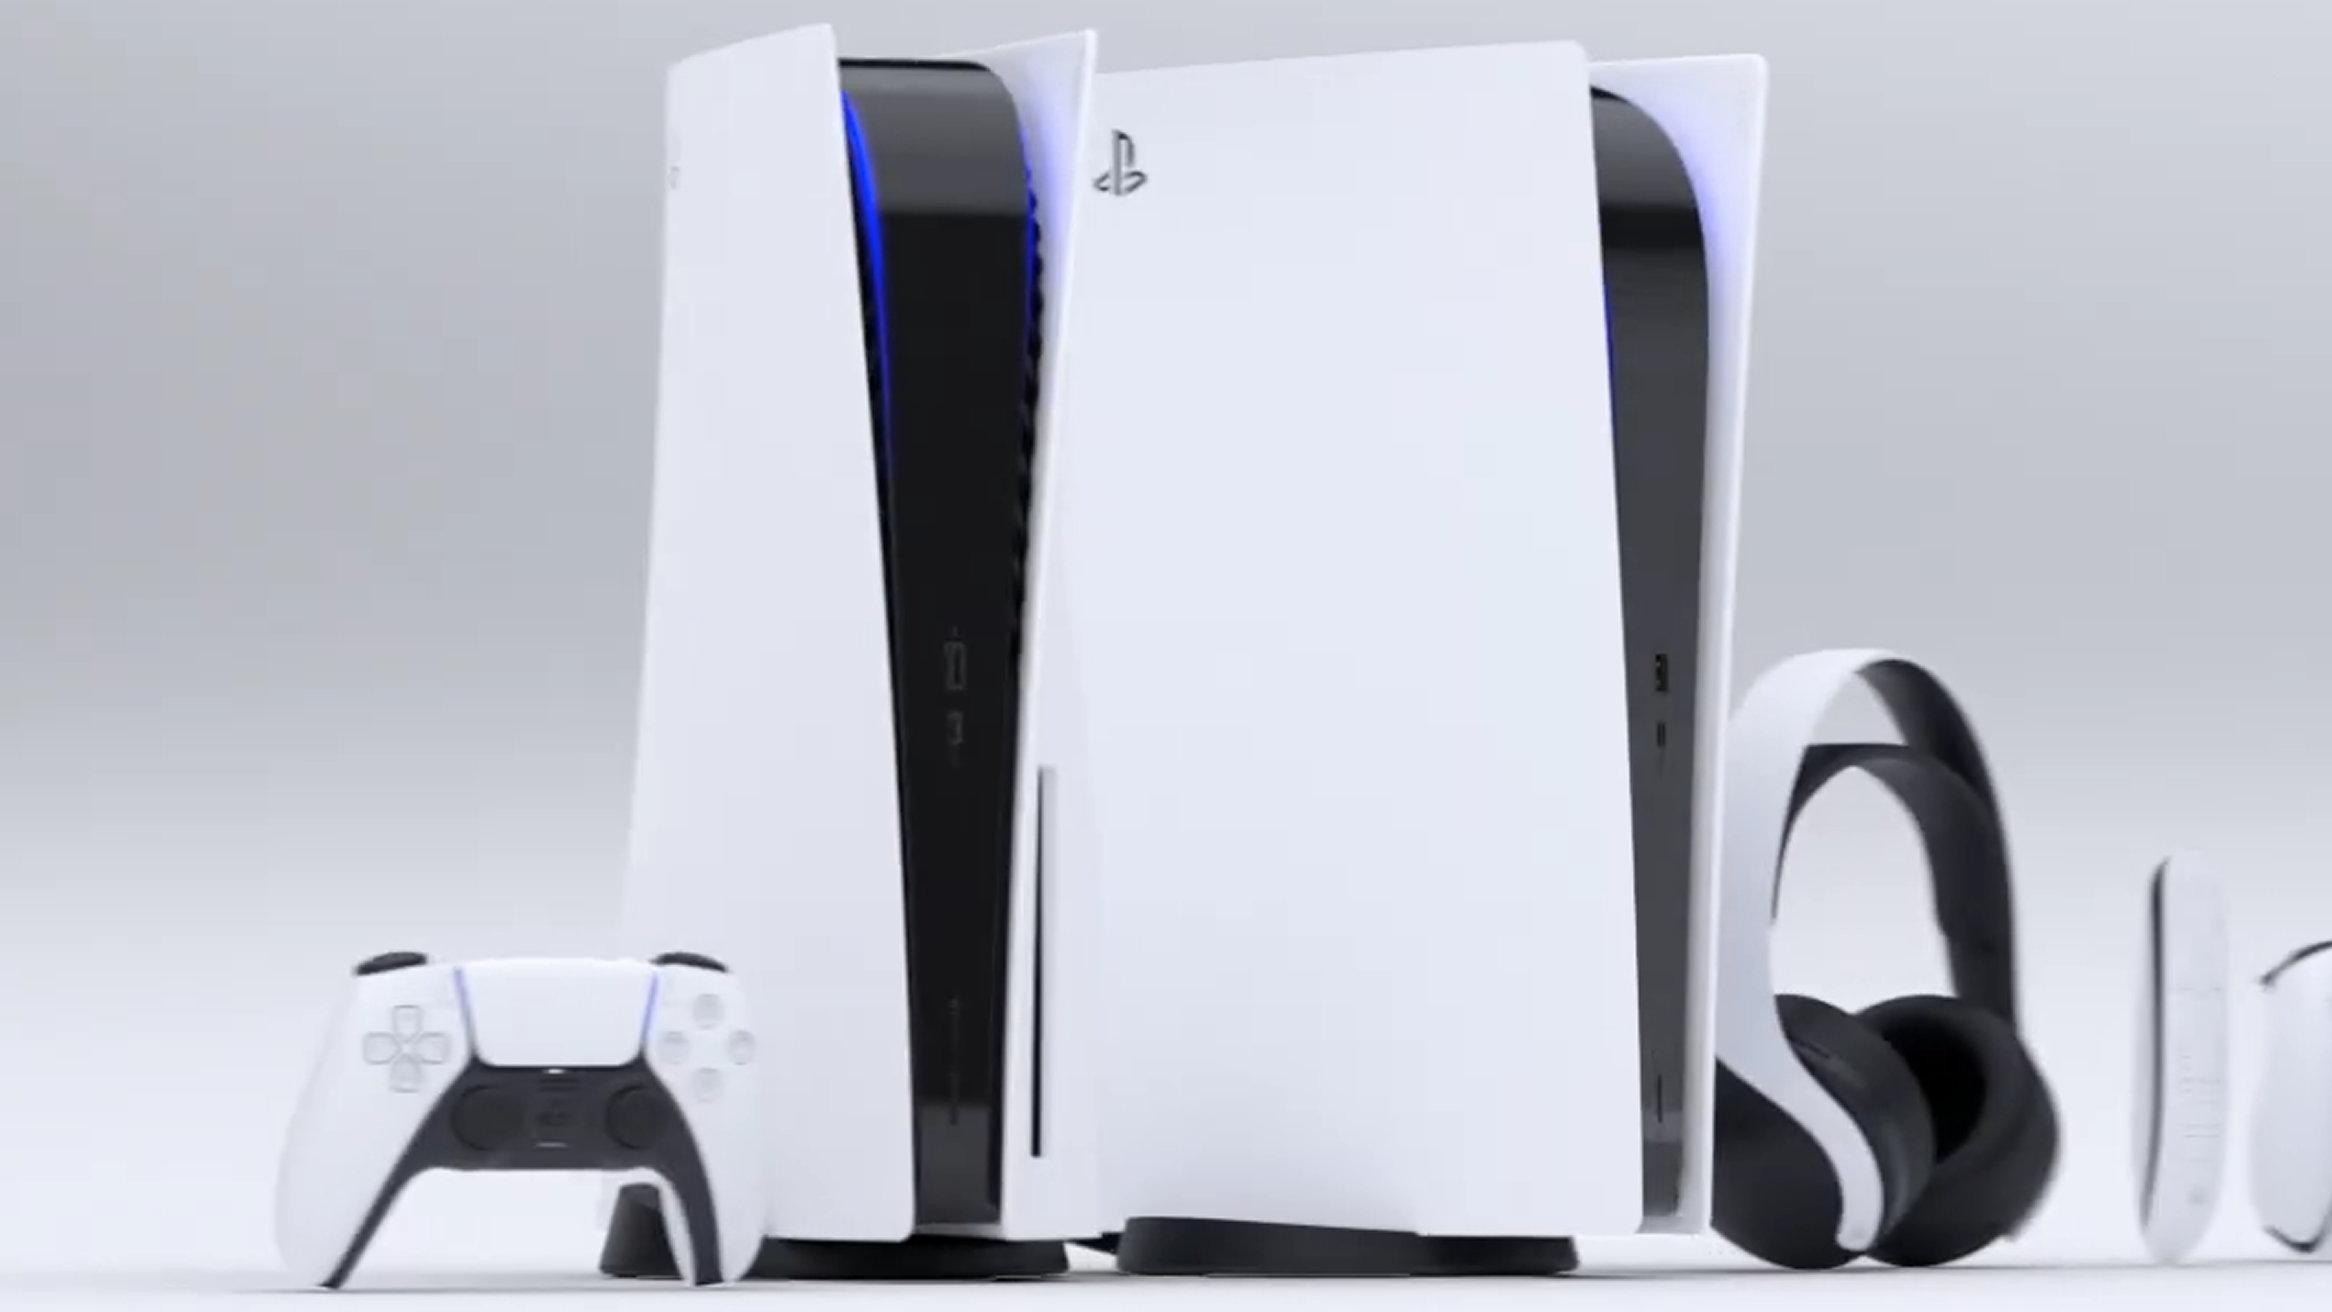 PS5、DL専用機と2種類。本体デザインもオシャレ感と既視感